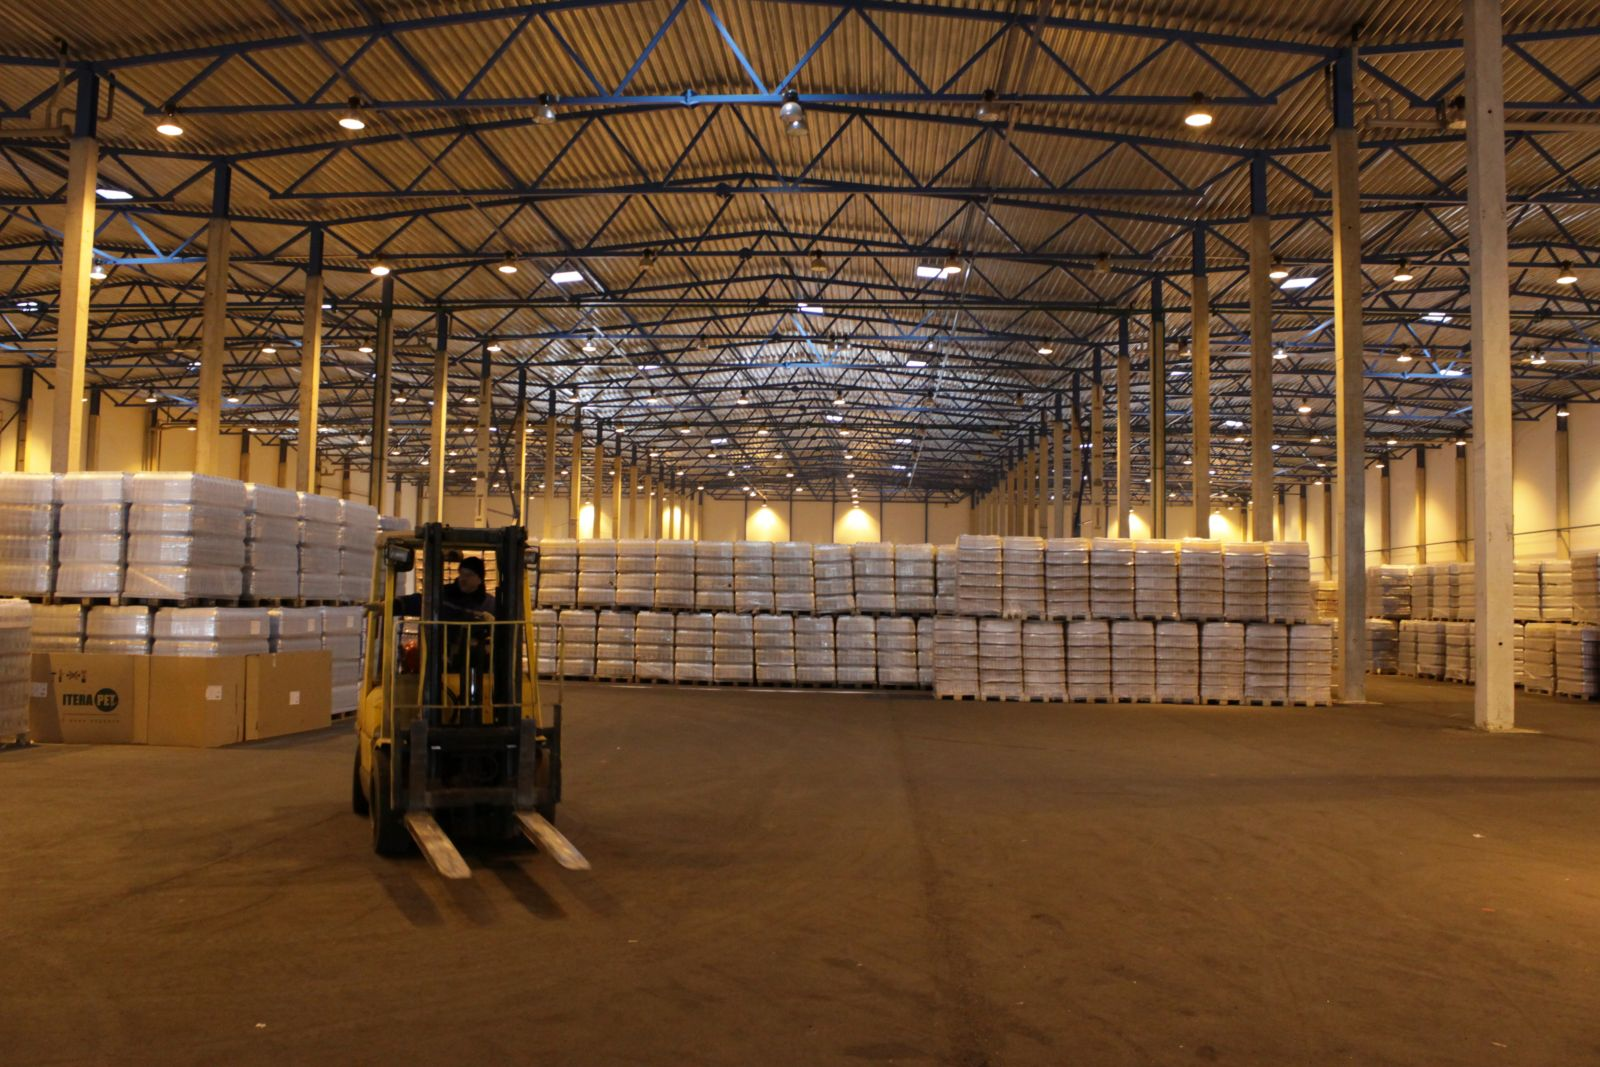 Biaya Jasa Kontraktor Bangun Pabrik & Gudang Manado, Sulawesi Utara